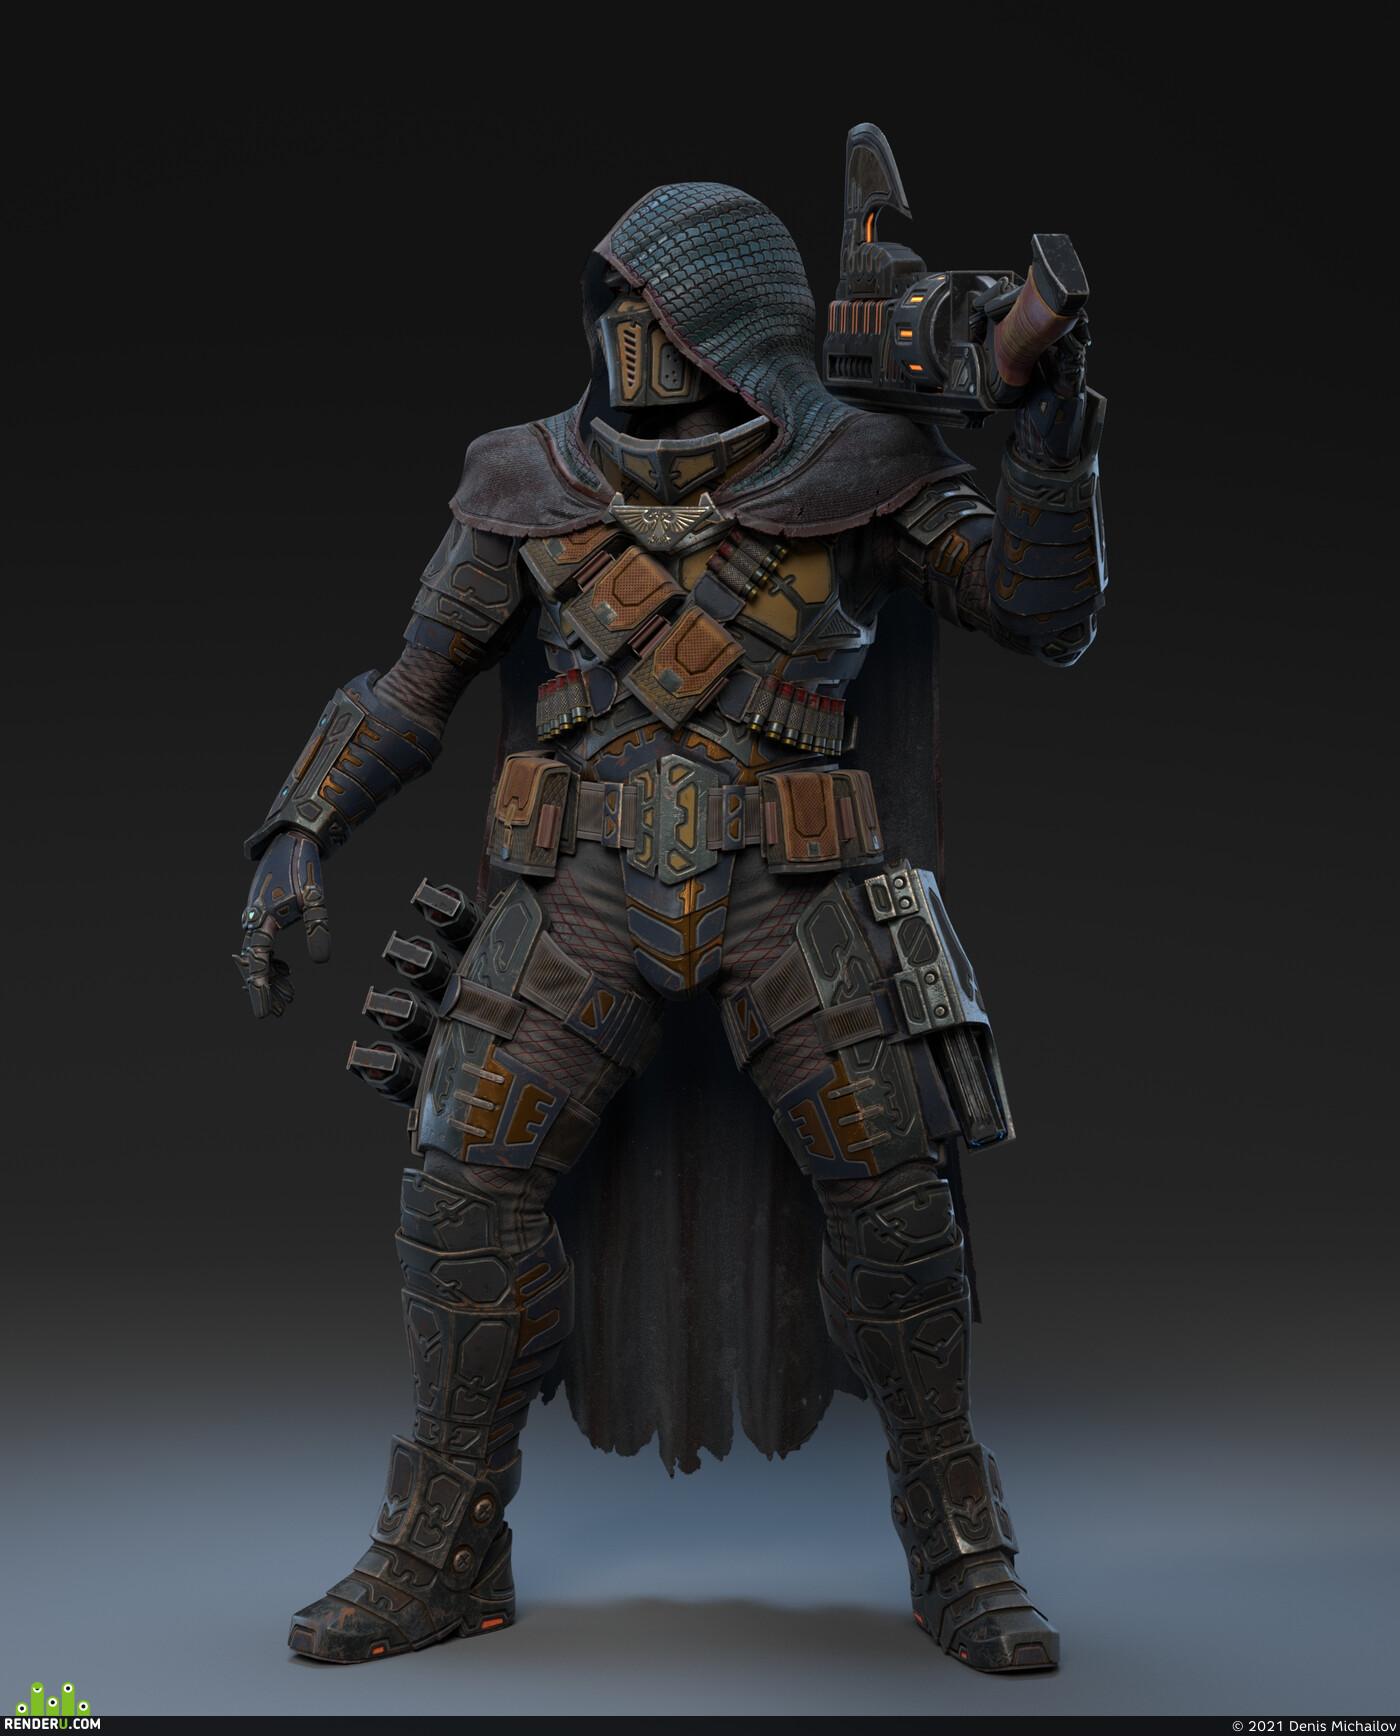 sci fi shotgun, shotgun, armor, sci fi armor, plate armor, weapon, soldier, fighter, shield, energy